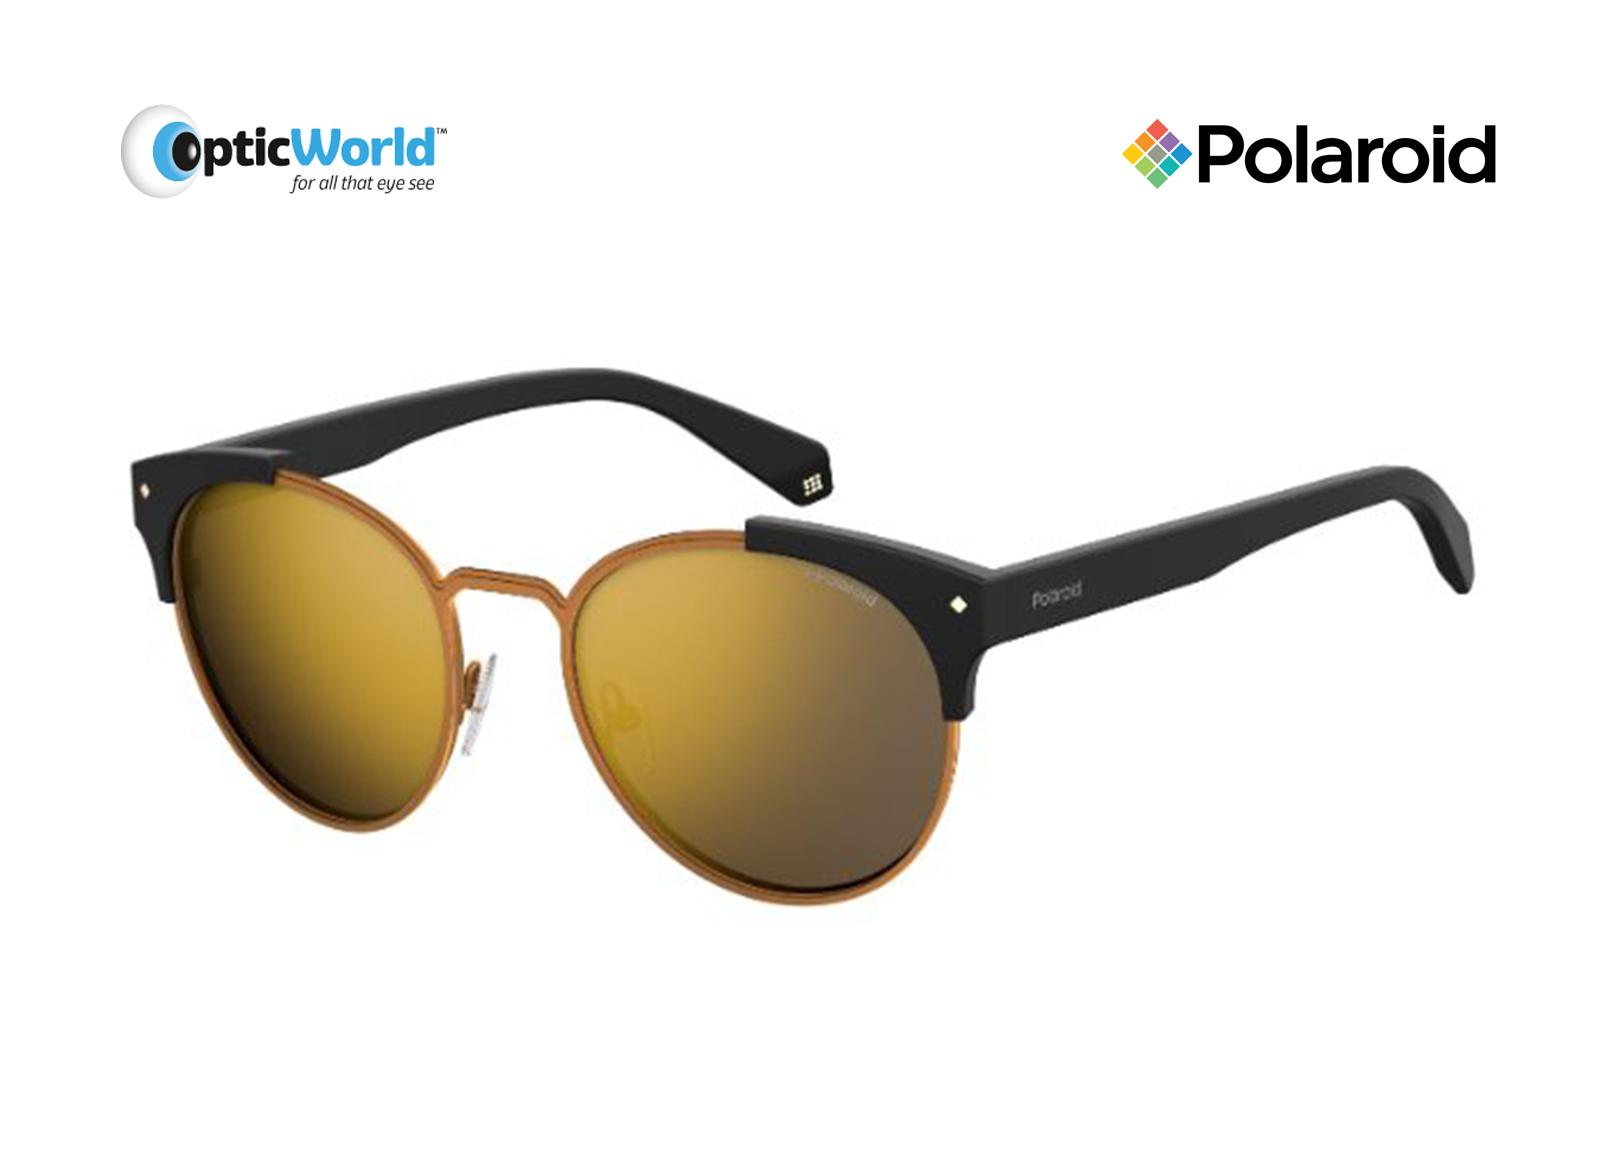 69a1b481f58 Sunglasses Polaroid Polarized Original Pld6038 s x 003 LM 56 Black ...